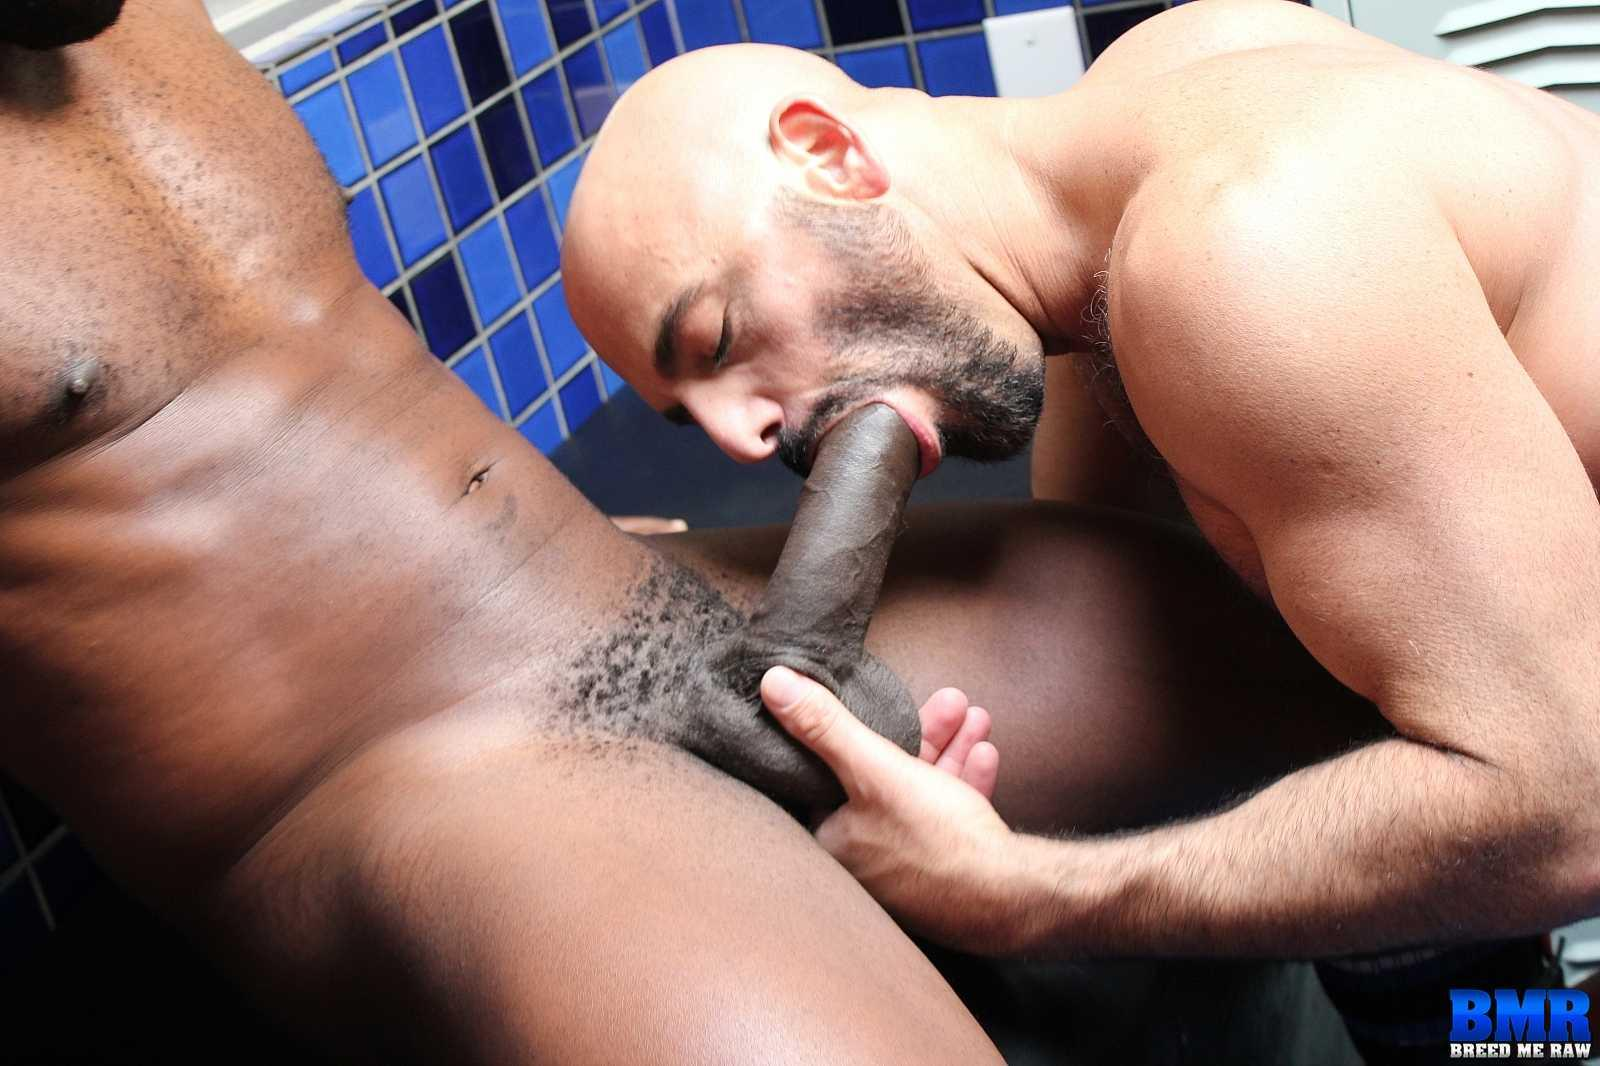 black women white men raw porn